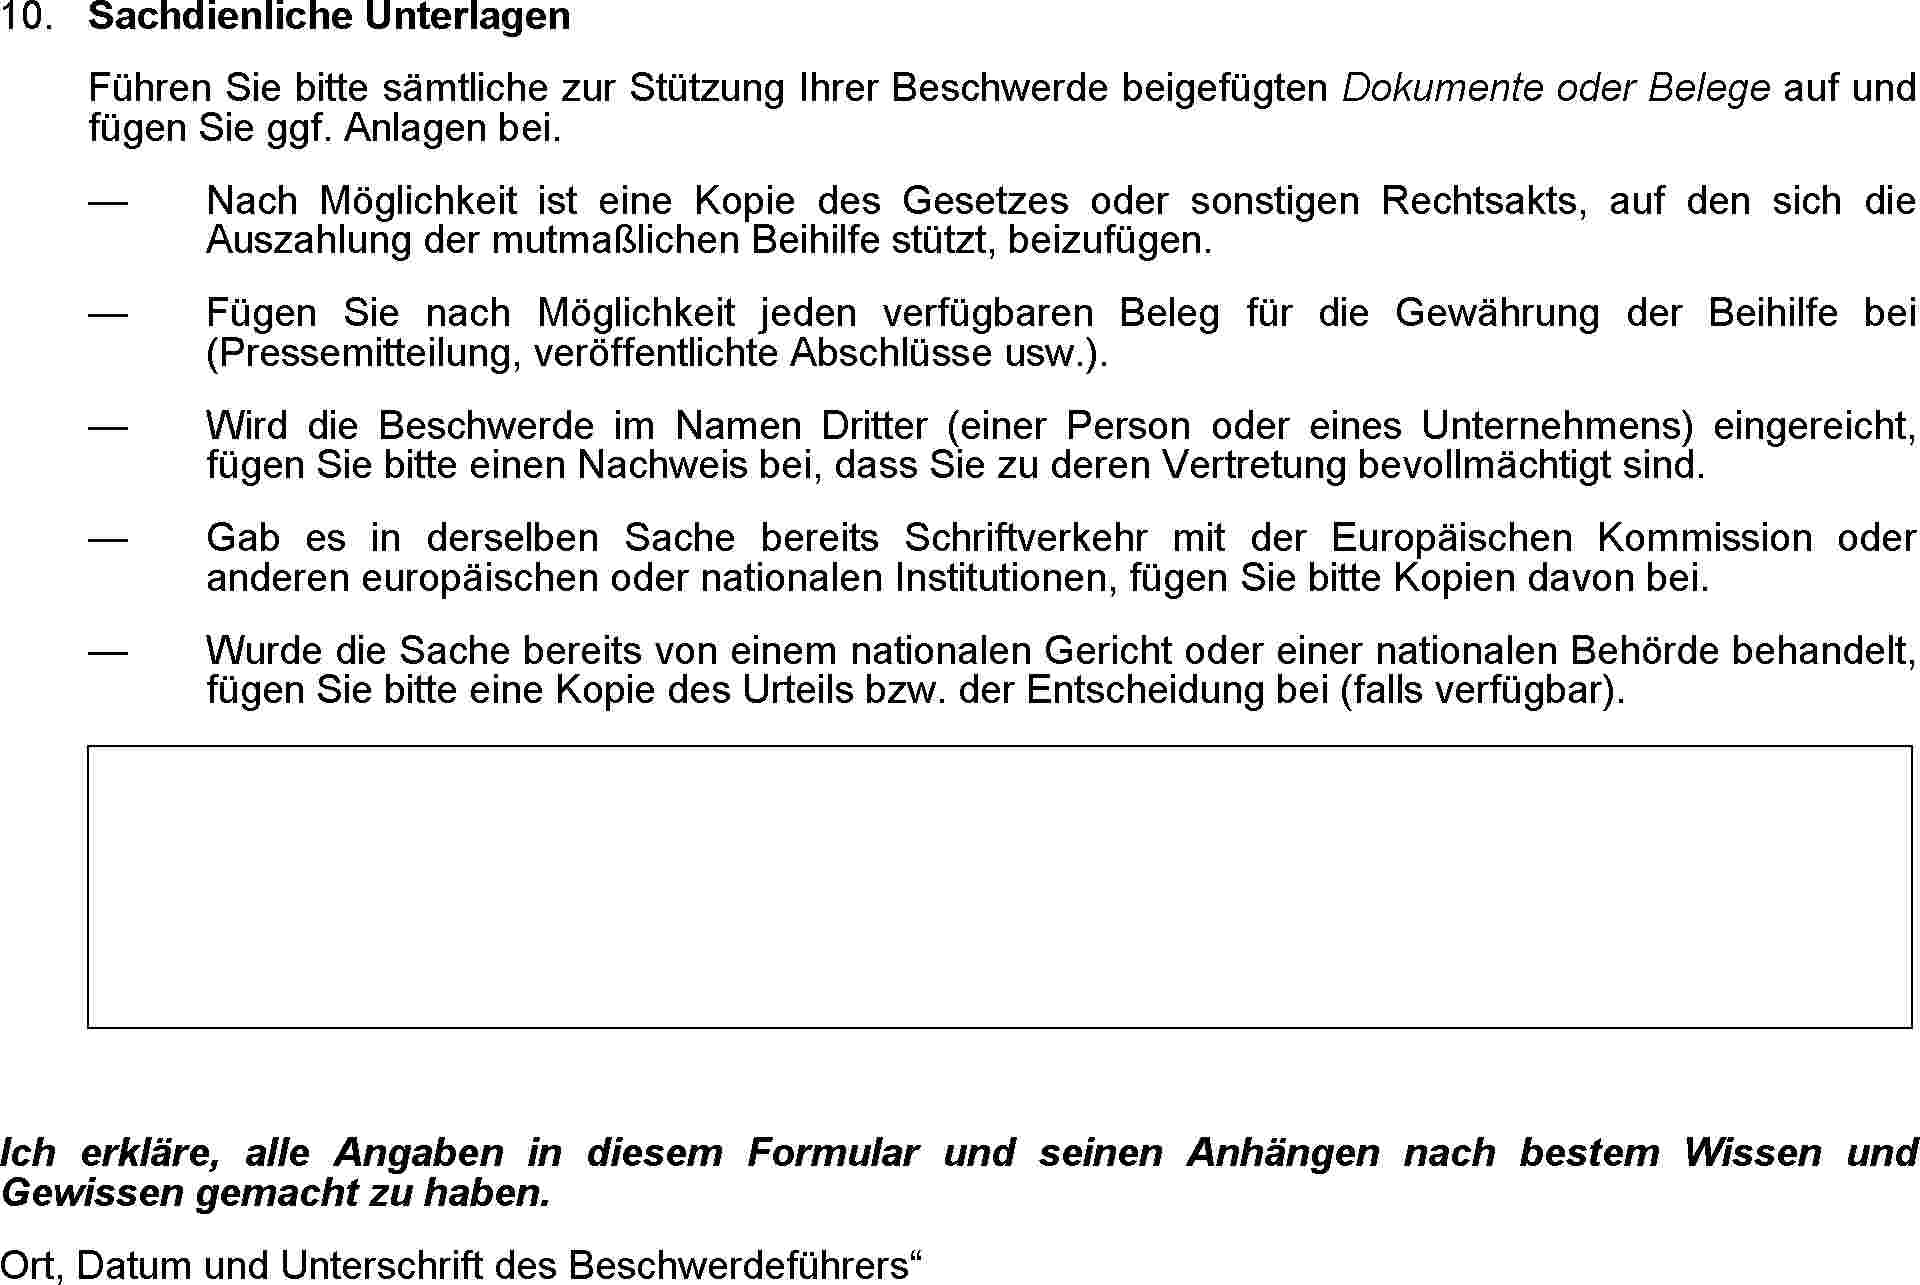 EUR-Lex - 02004R0794-20151230 - EN - EUR-Lex